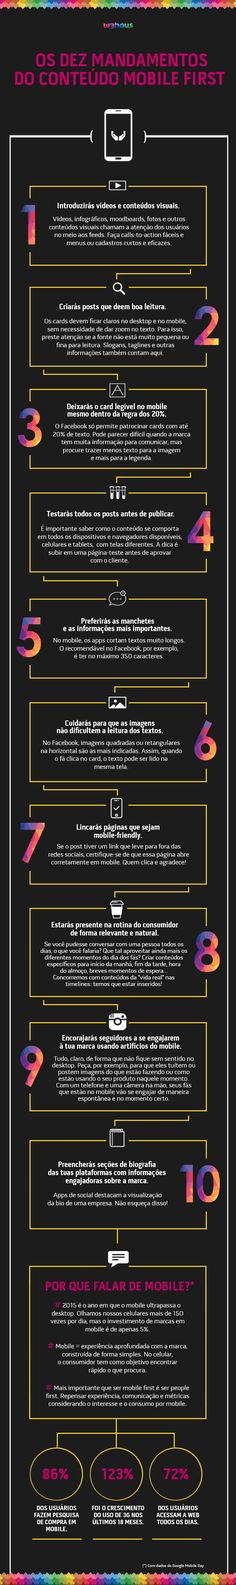 Infográfico: Dez mandamentos do mobile first